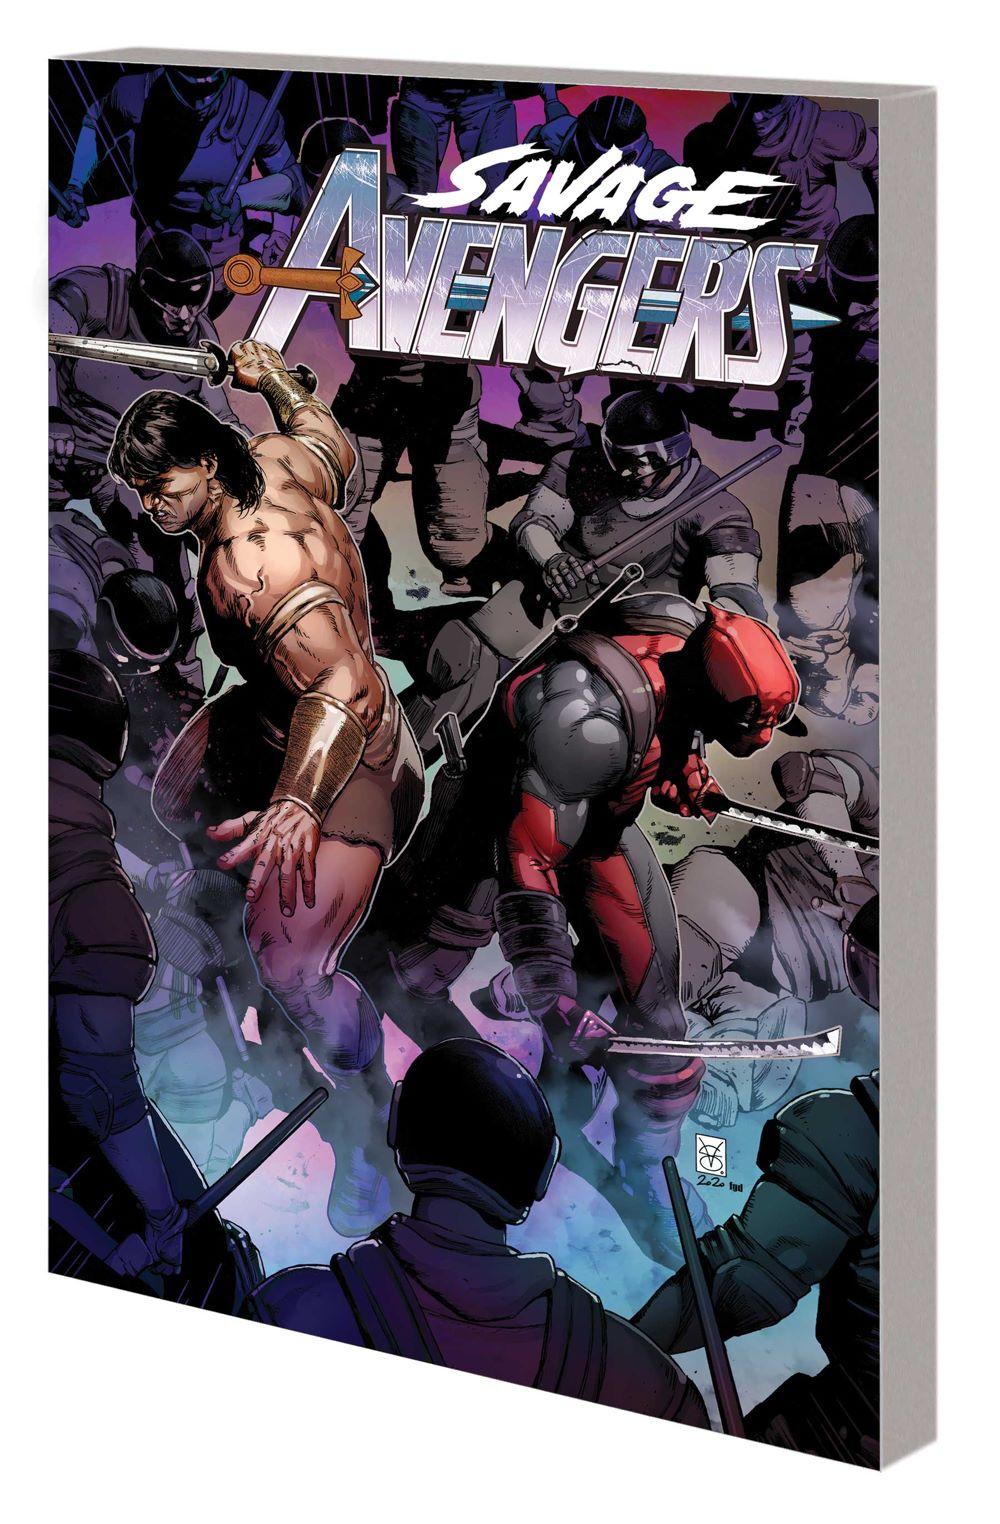 SAVAVENGERS_VOL_4_TPB Marvel Comics August 2021 Solicitations